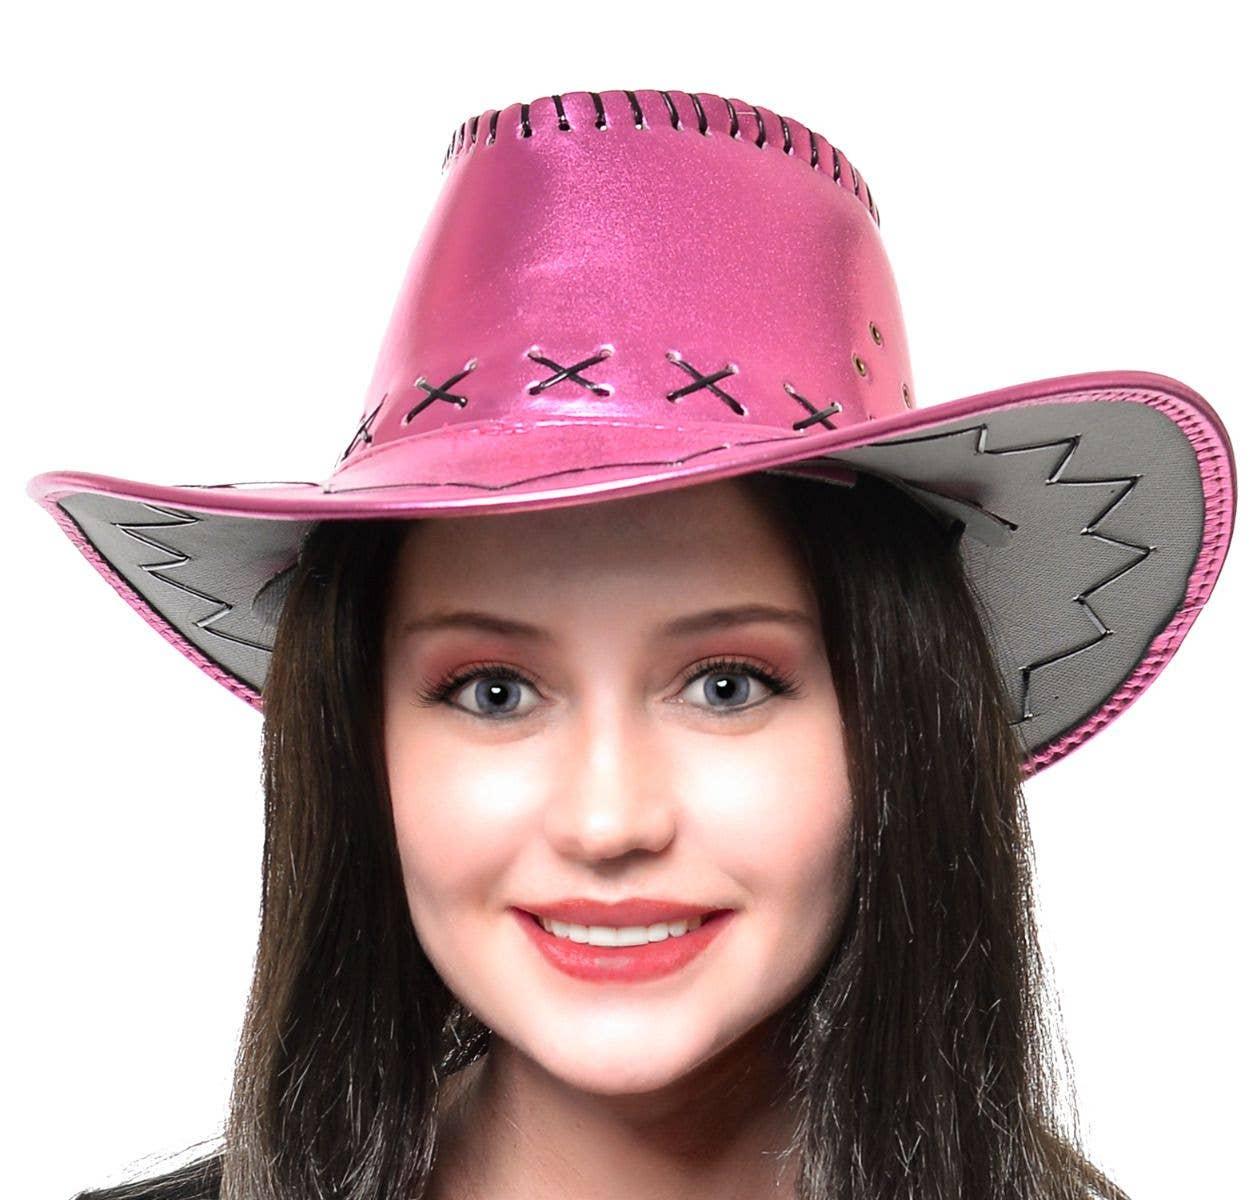 5175b2824ef7b Metallic Pink Women's Cowboy Hat Costume Accessory